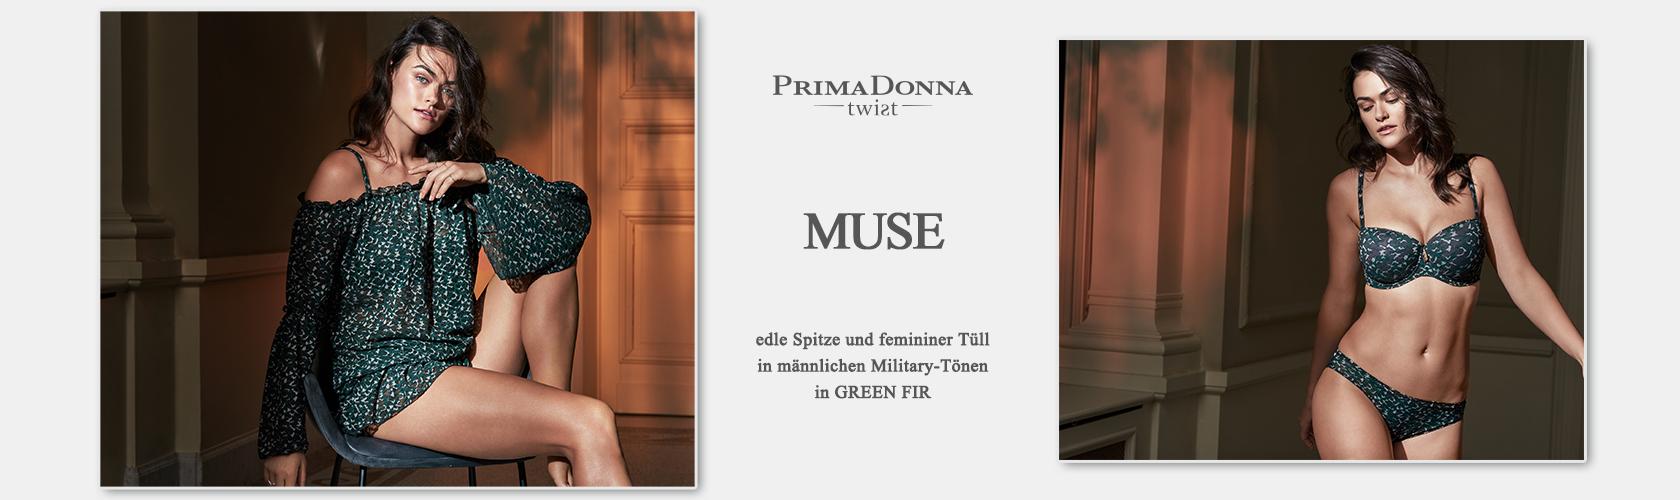 Slideshow MUSE GFR 28.9.